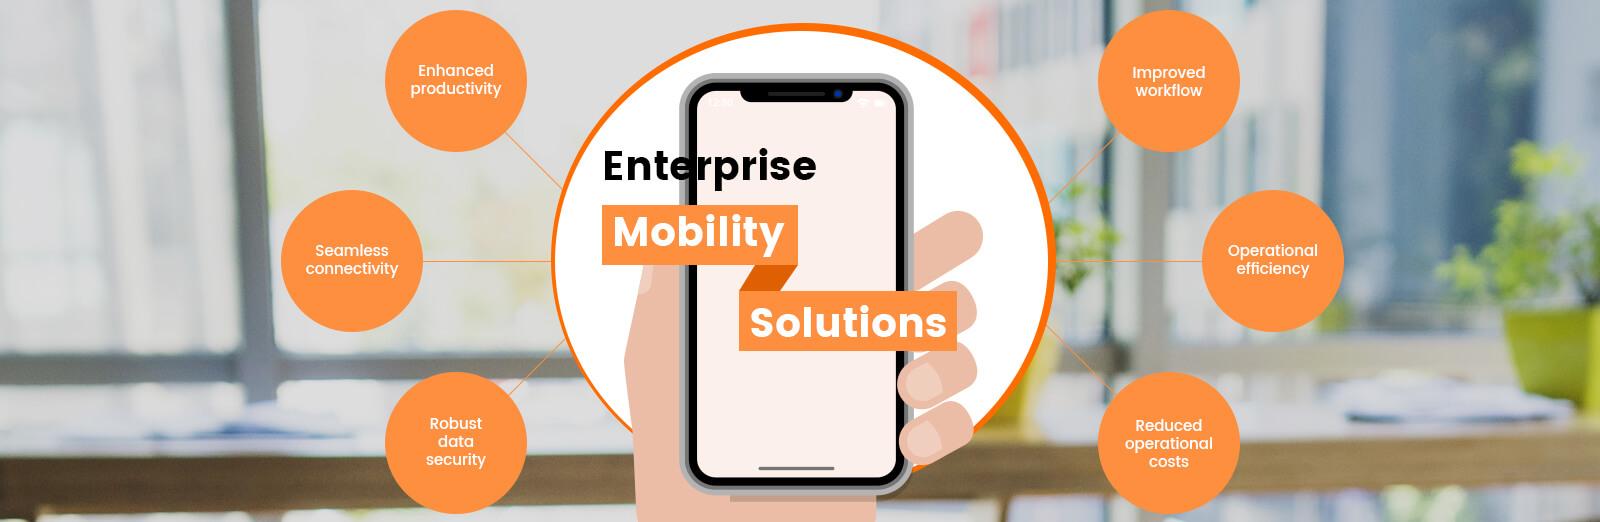 enterprise mobility solutions